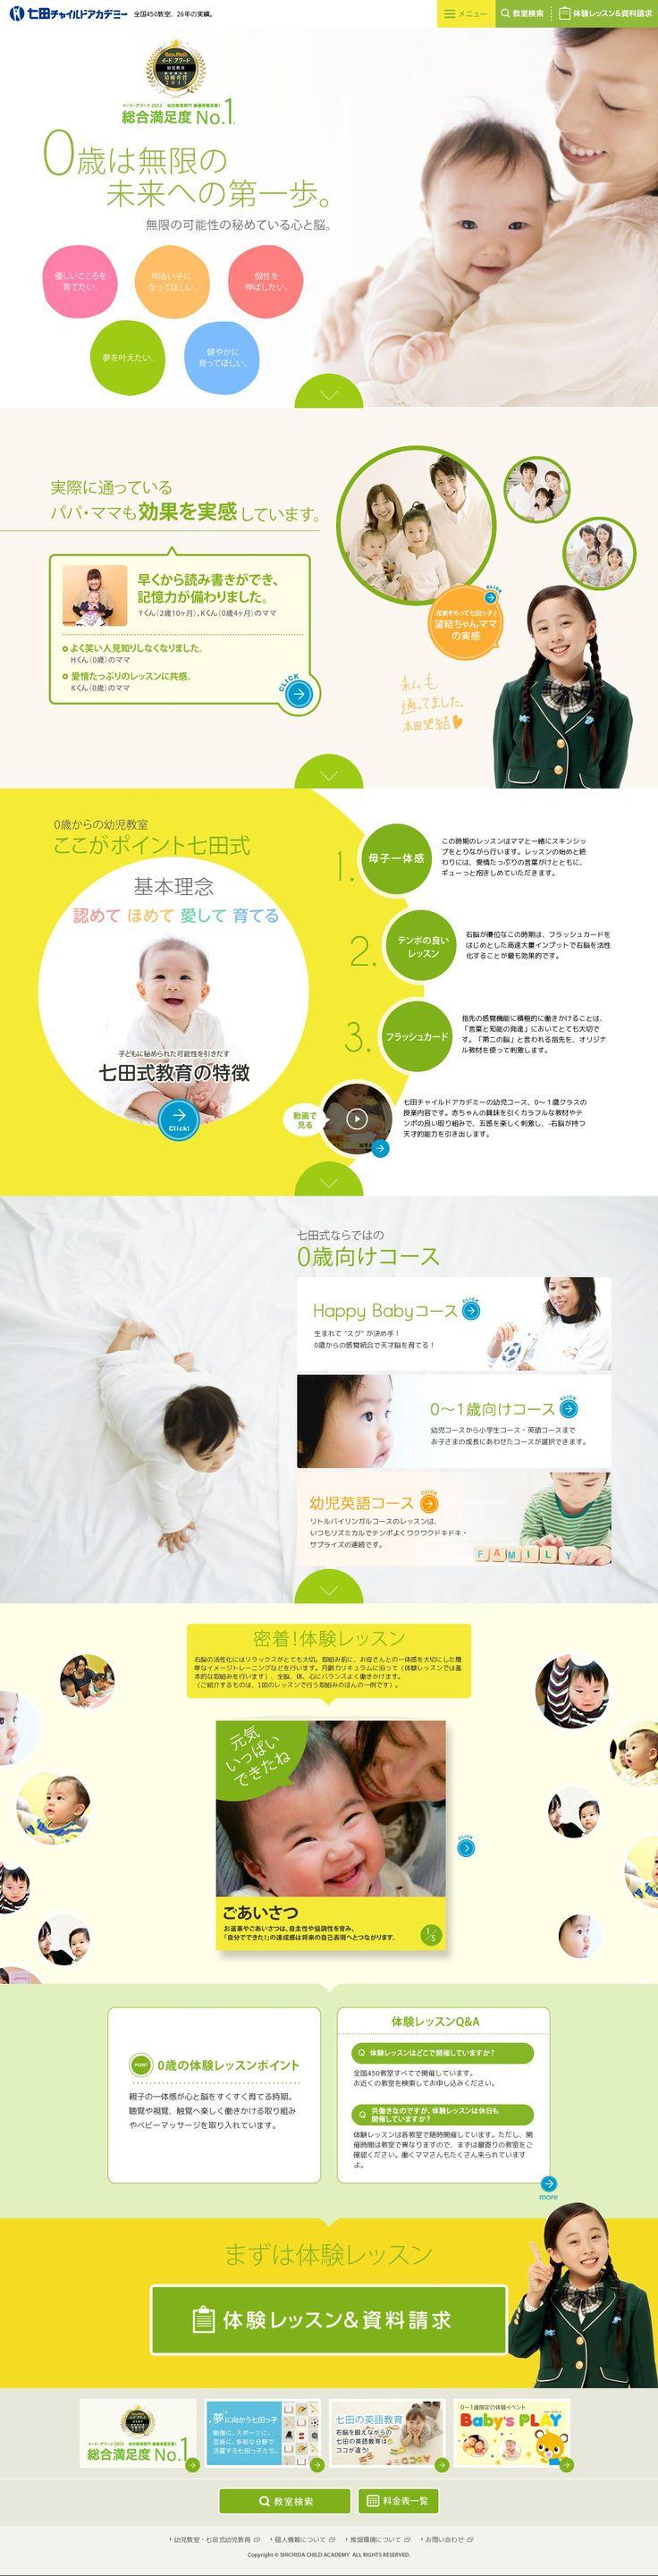 The website 'http://baby.shichida.ne.jp/age_0/' courtesy of @Pinstamatic (http://pinstamatic.com)